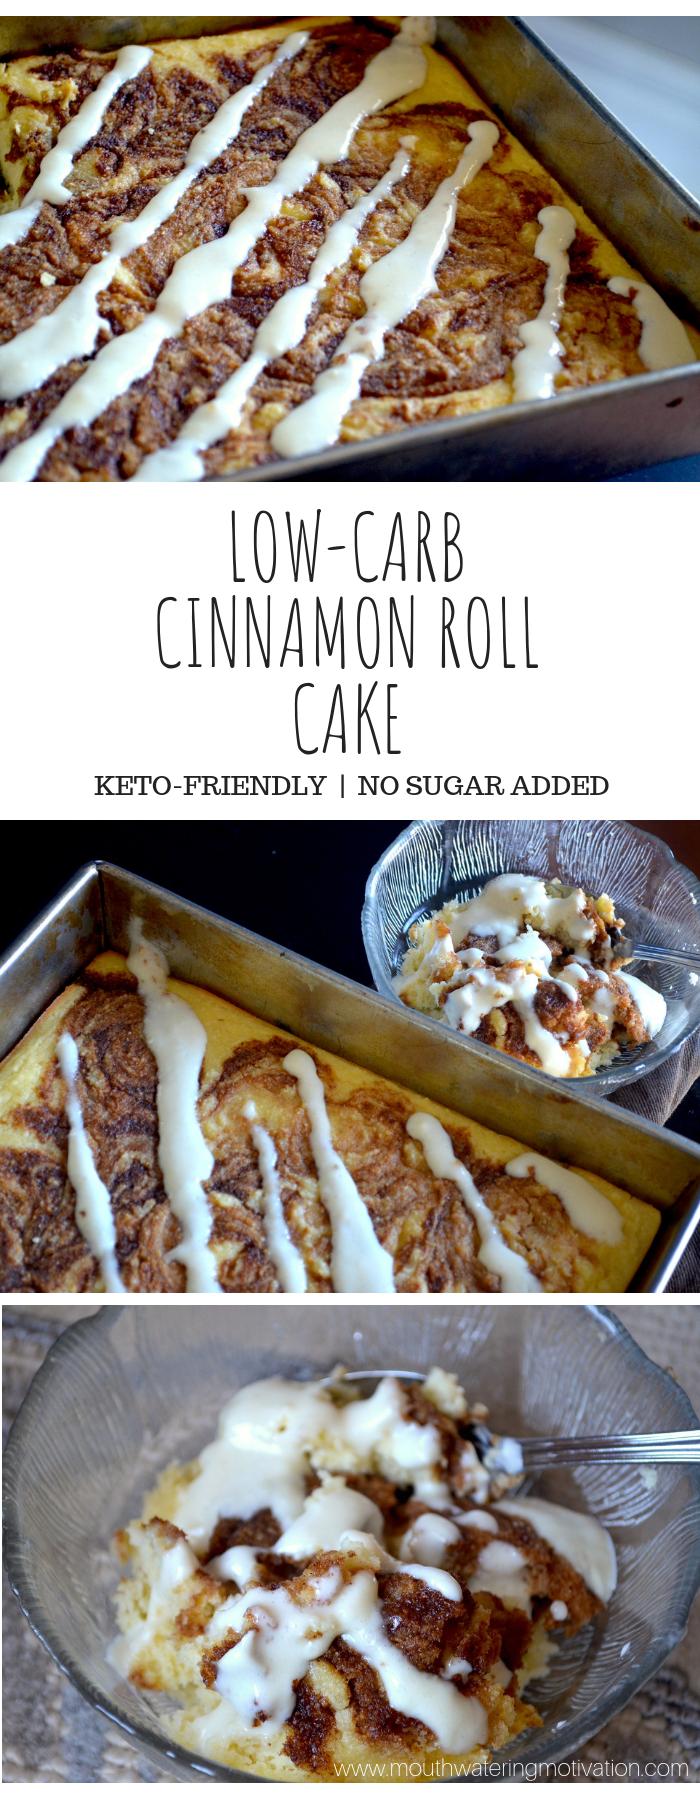 LOW CARB CINNAMON ROLL CAKE